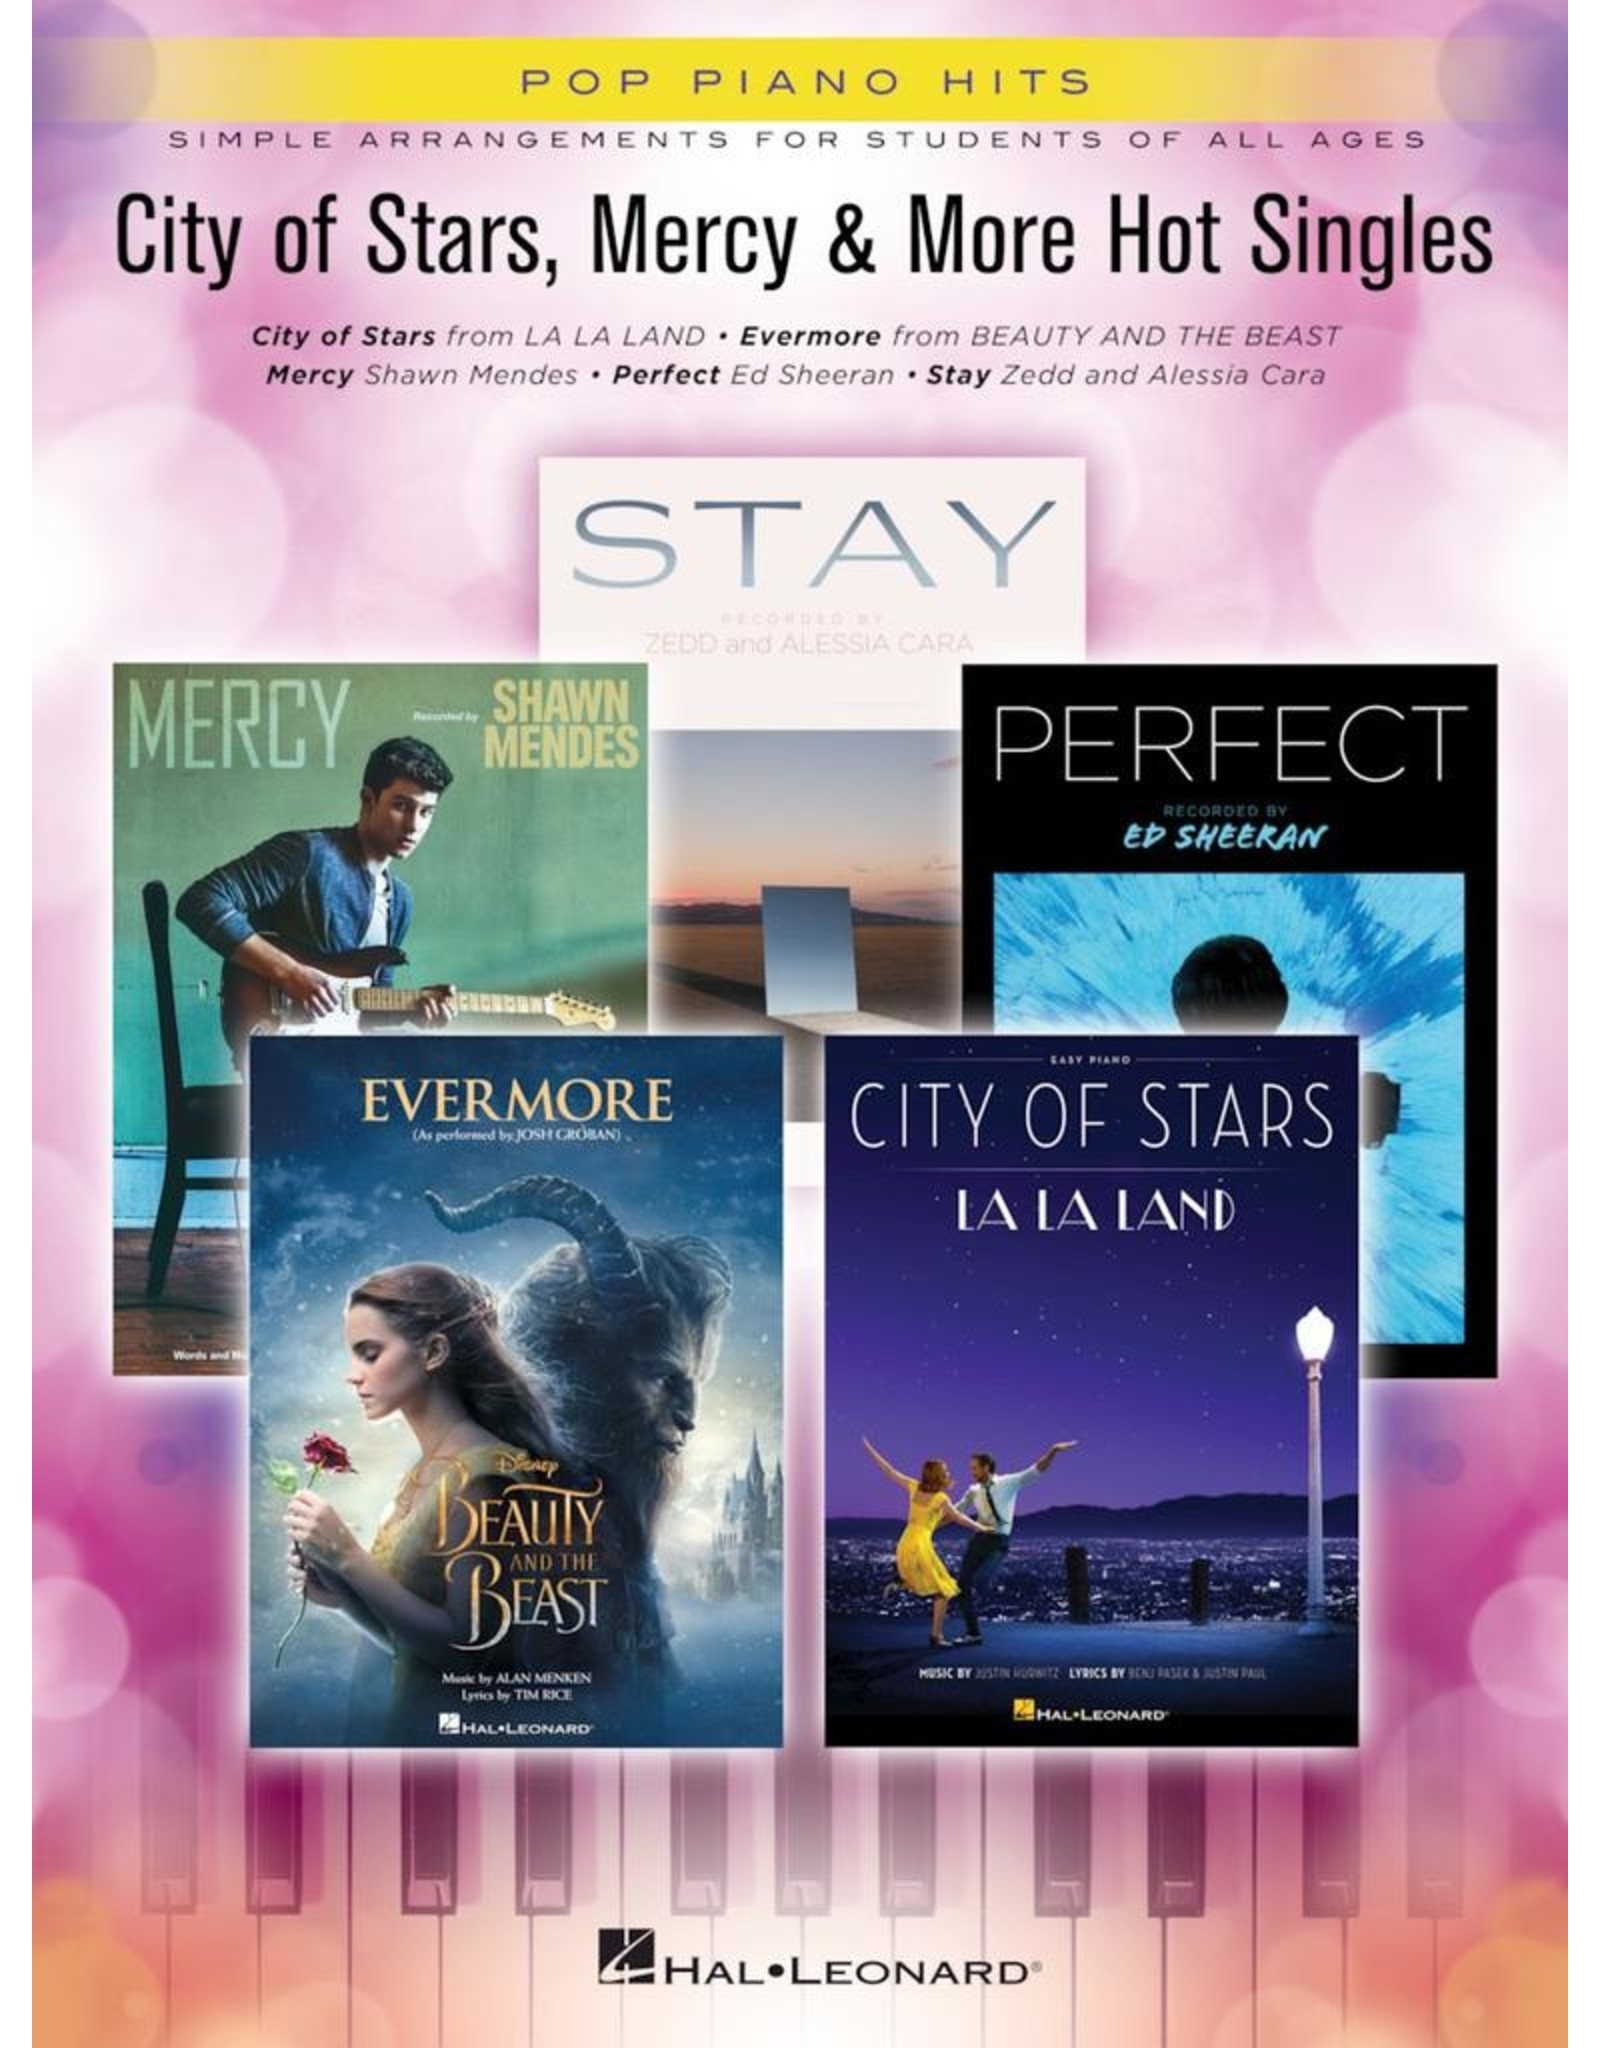 Hal Leonard City of Stars, Mercy, and More Hot Singles Easy Piano